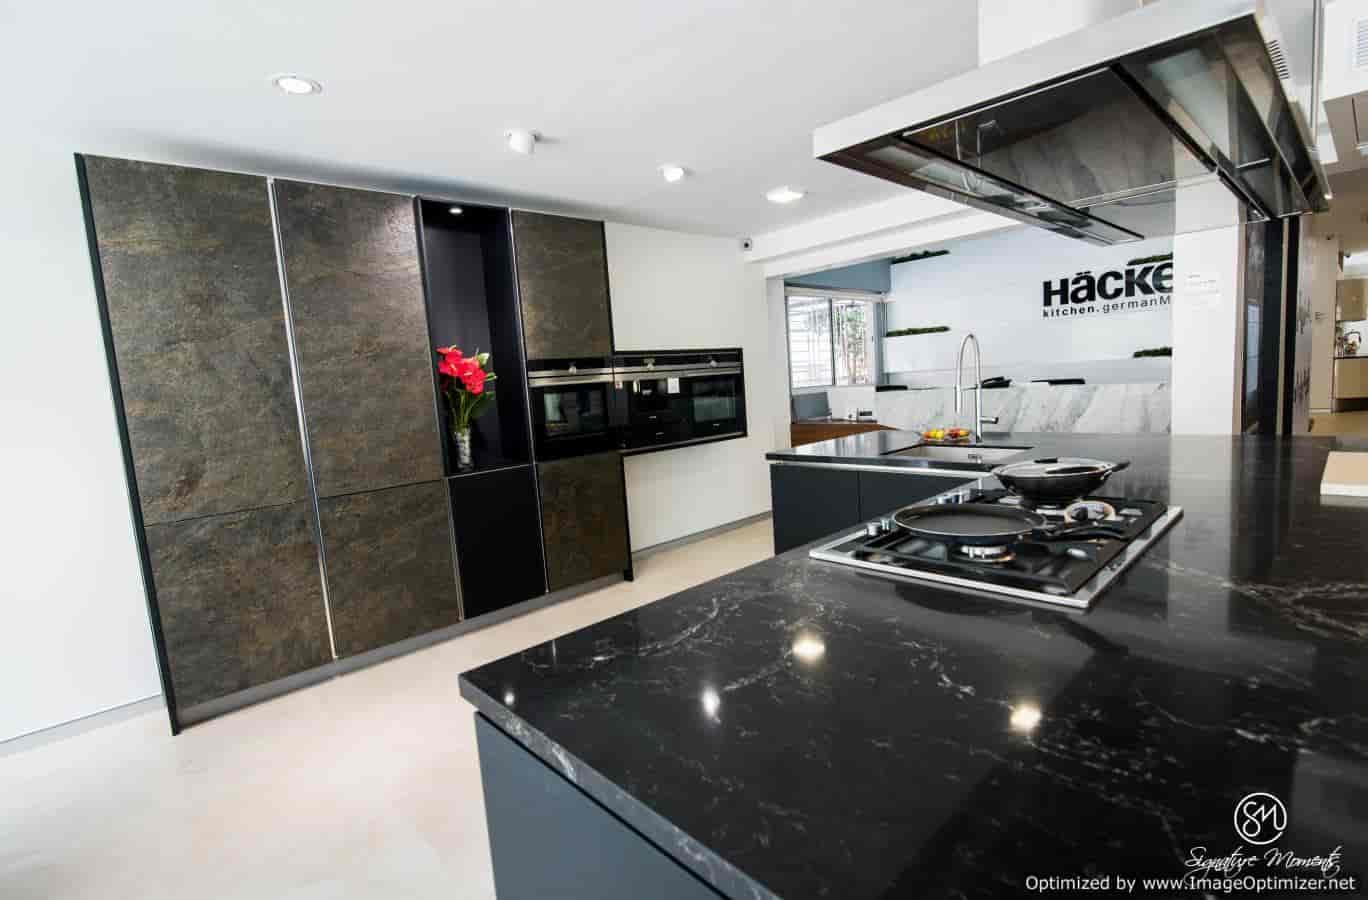 Haecker Lack Matt Schwarz #26: Hacker Modular Kitchens Rs Puram Coimbatore  Modular Kitchen Dealers In Coimbatore Justdial.